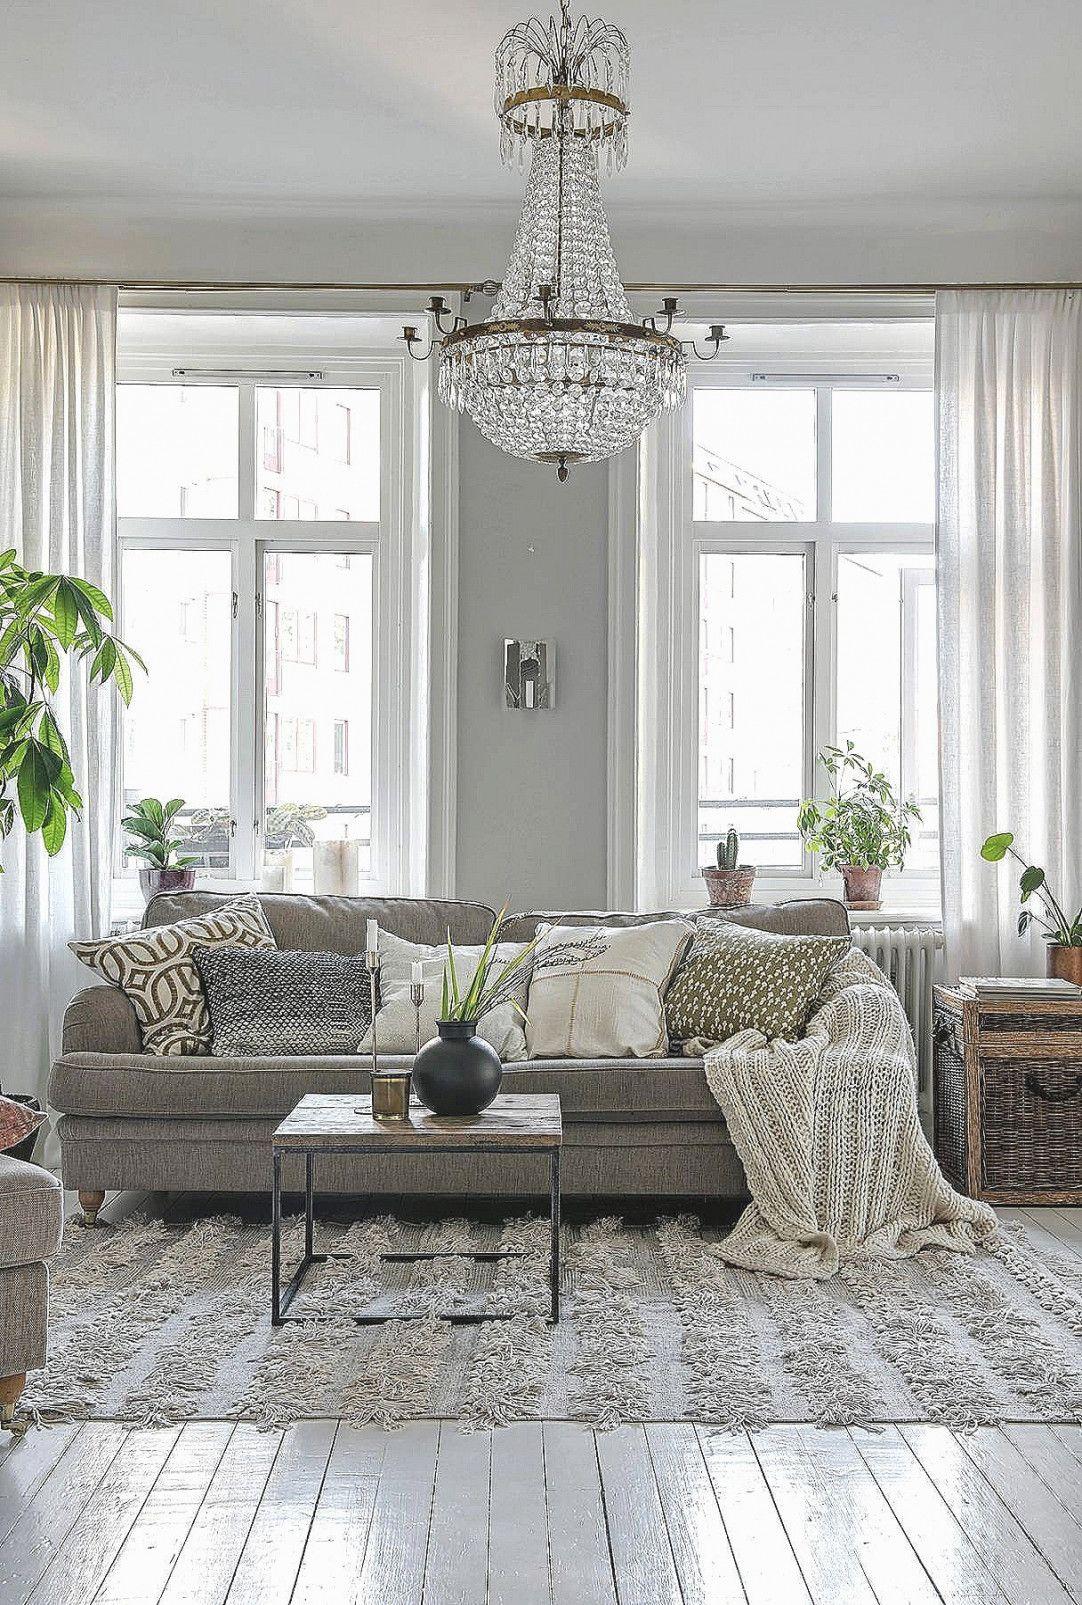 Luxury Wall Art 30 Attractive Hardwood Floor Decorating In 2020 Elegant Living Room Living Room Images Wall Decor Living Room